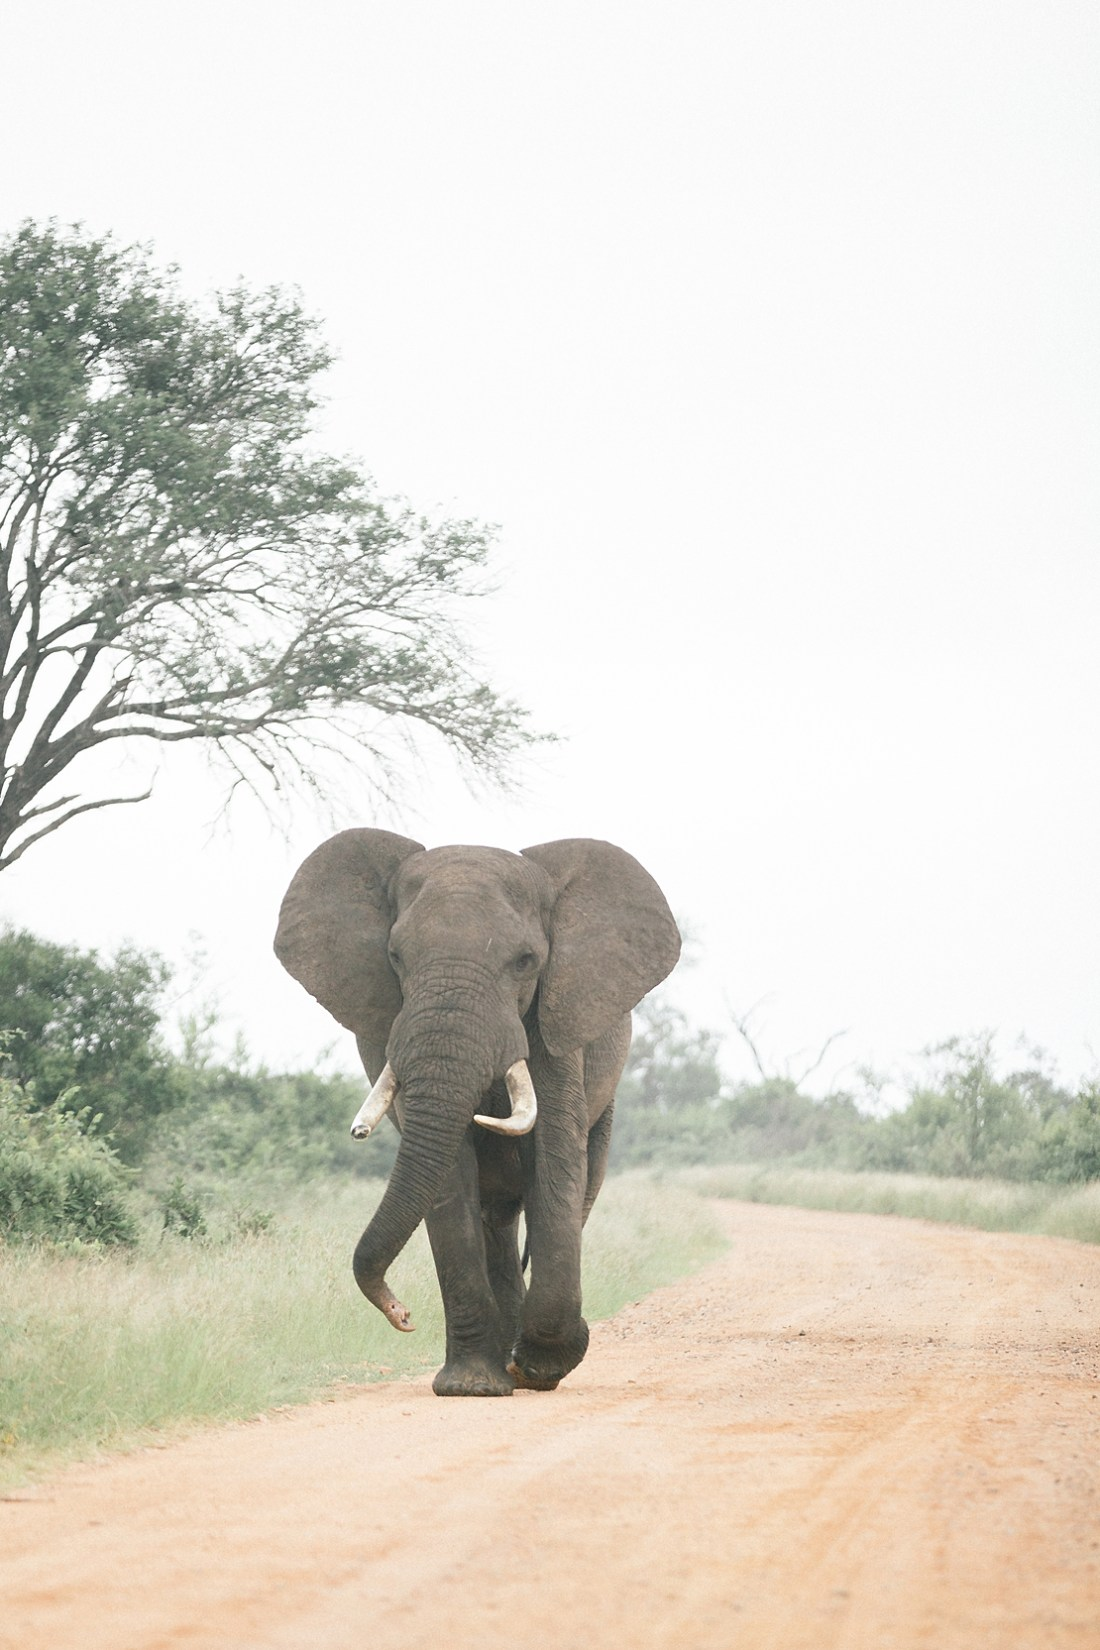 Bull elephant in Kruger national park